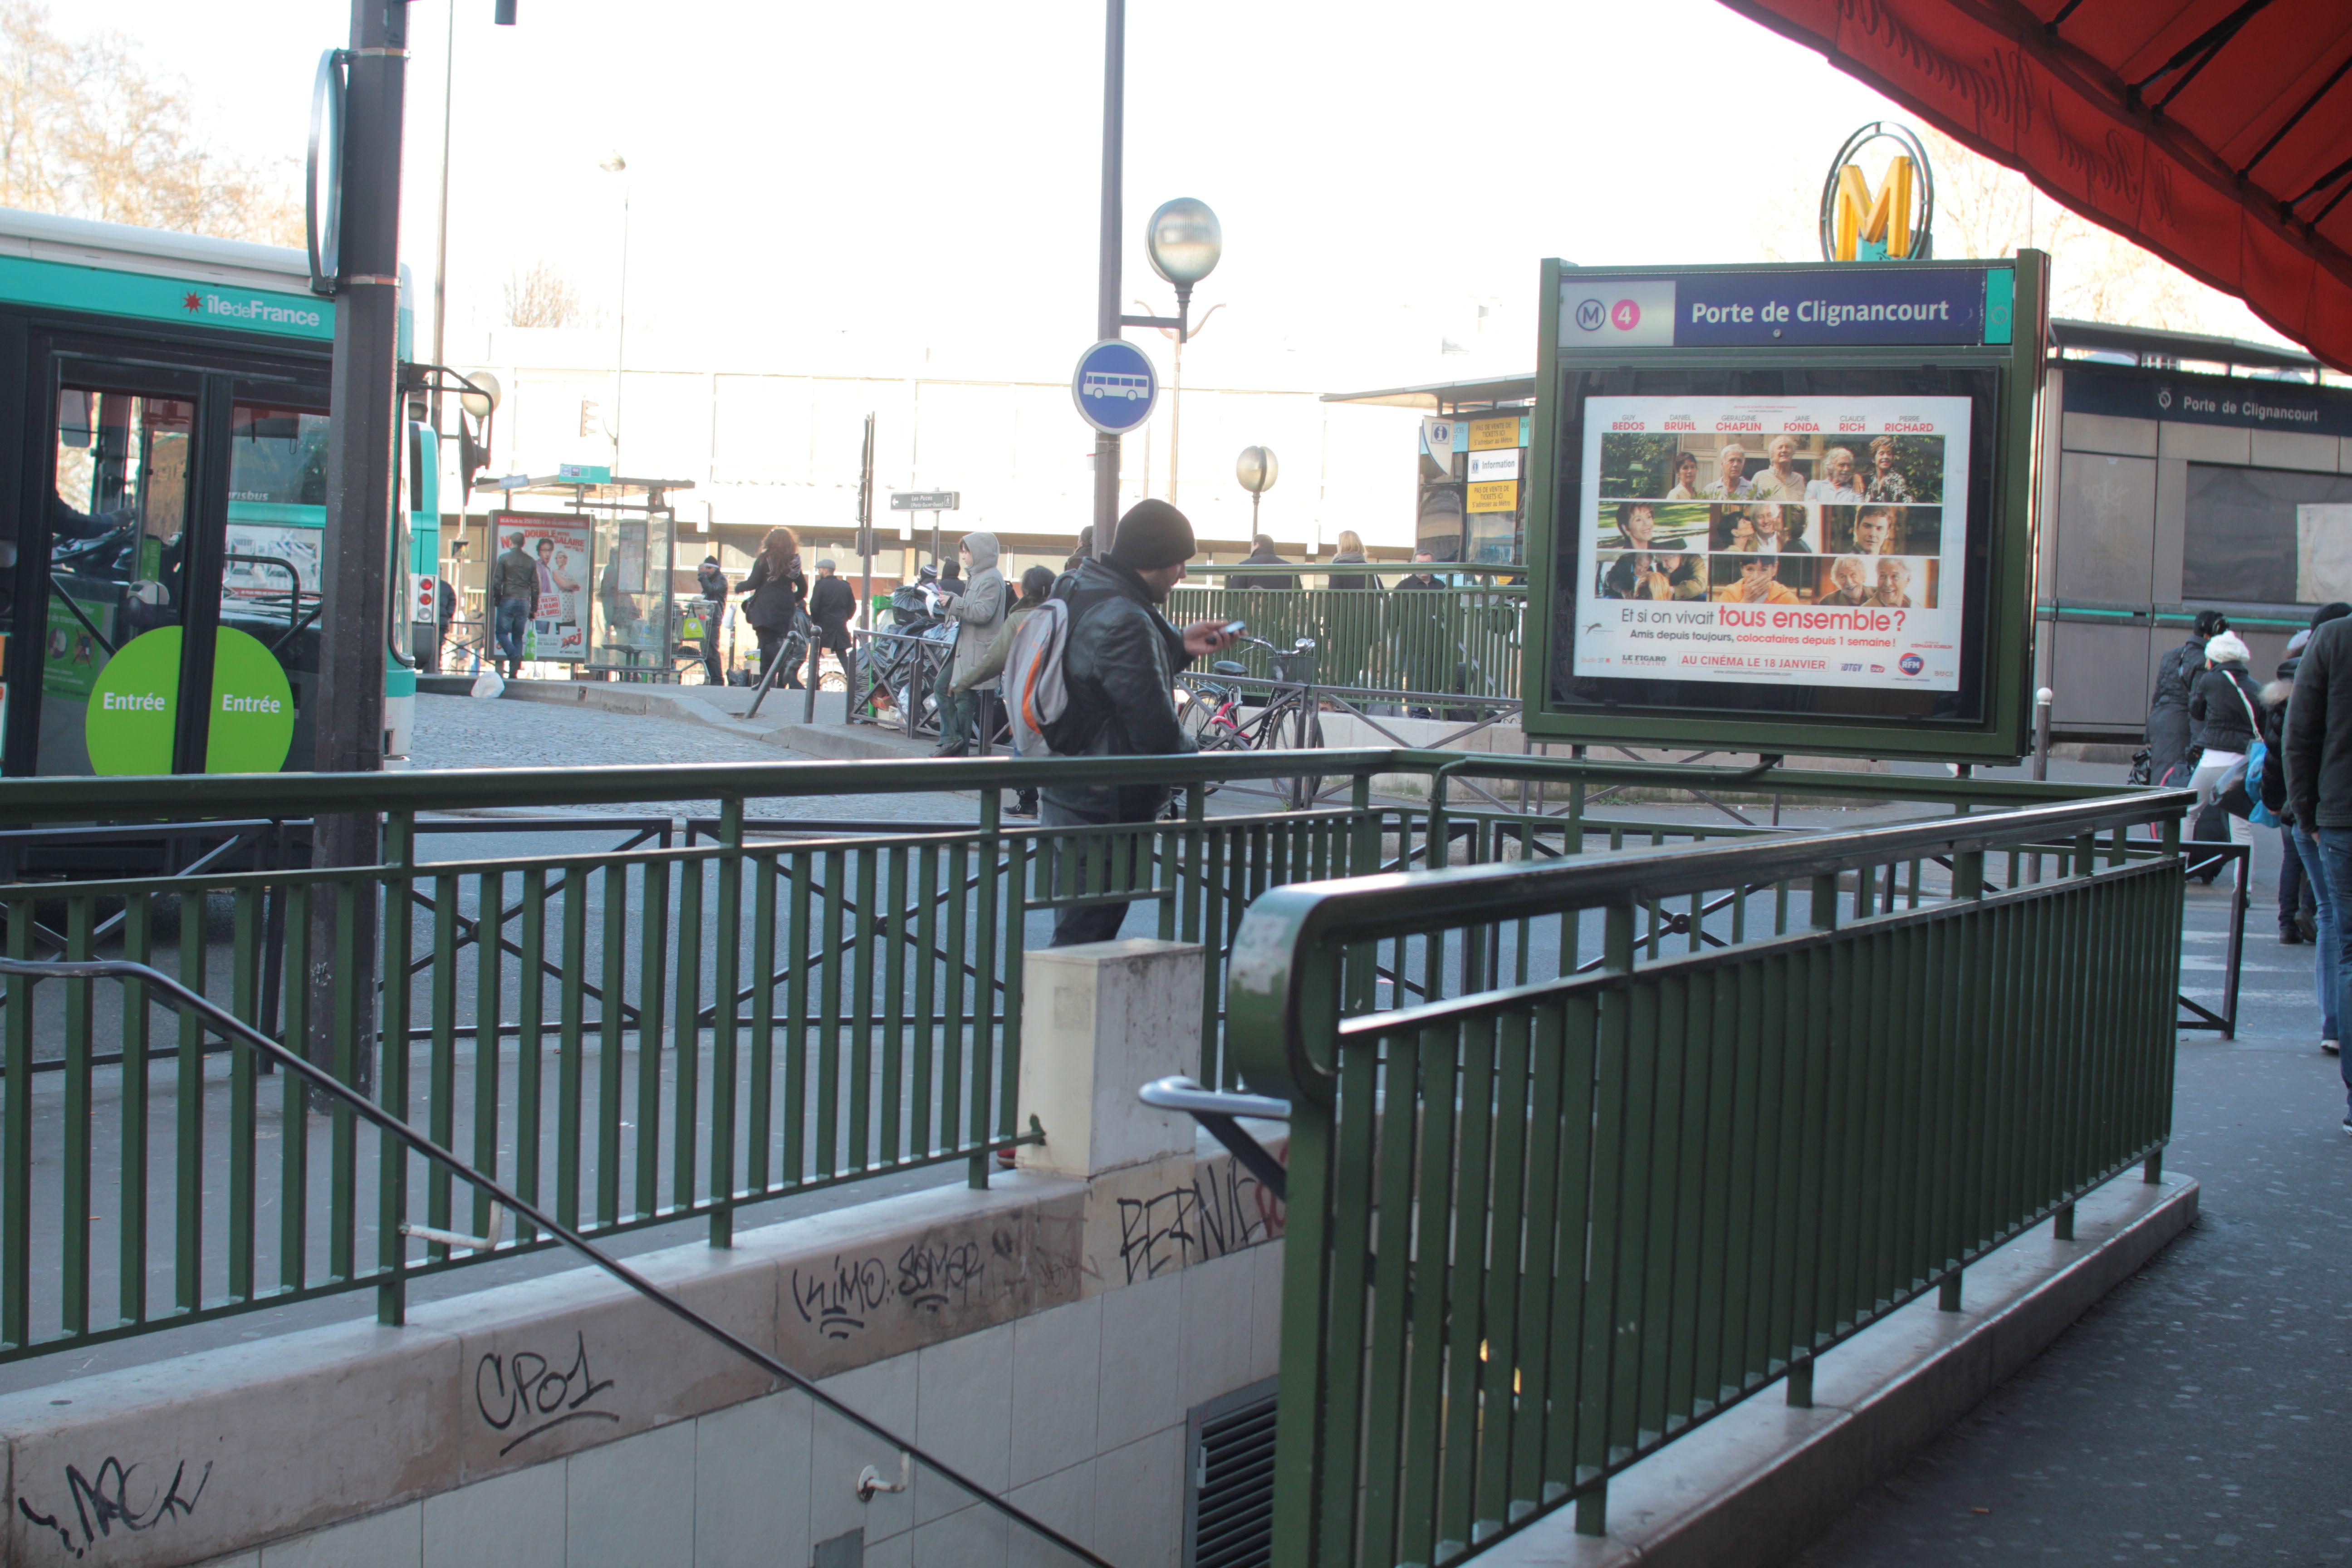 Porte De Clignancourt Paris